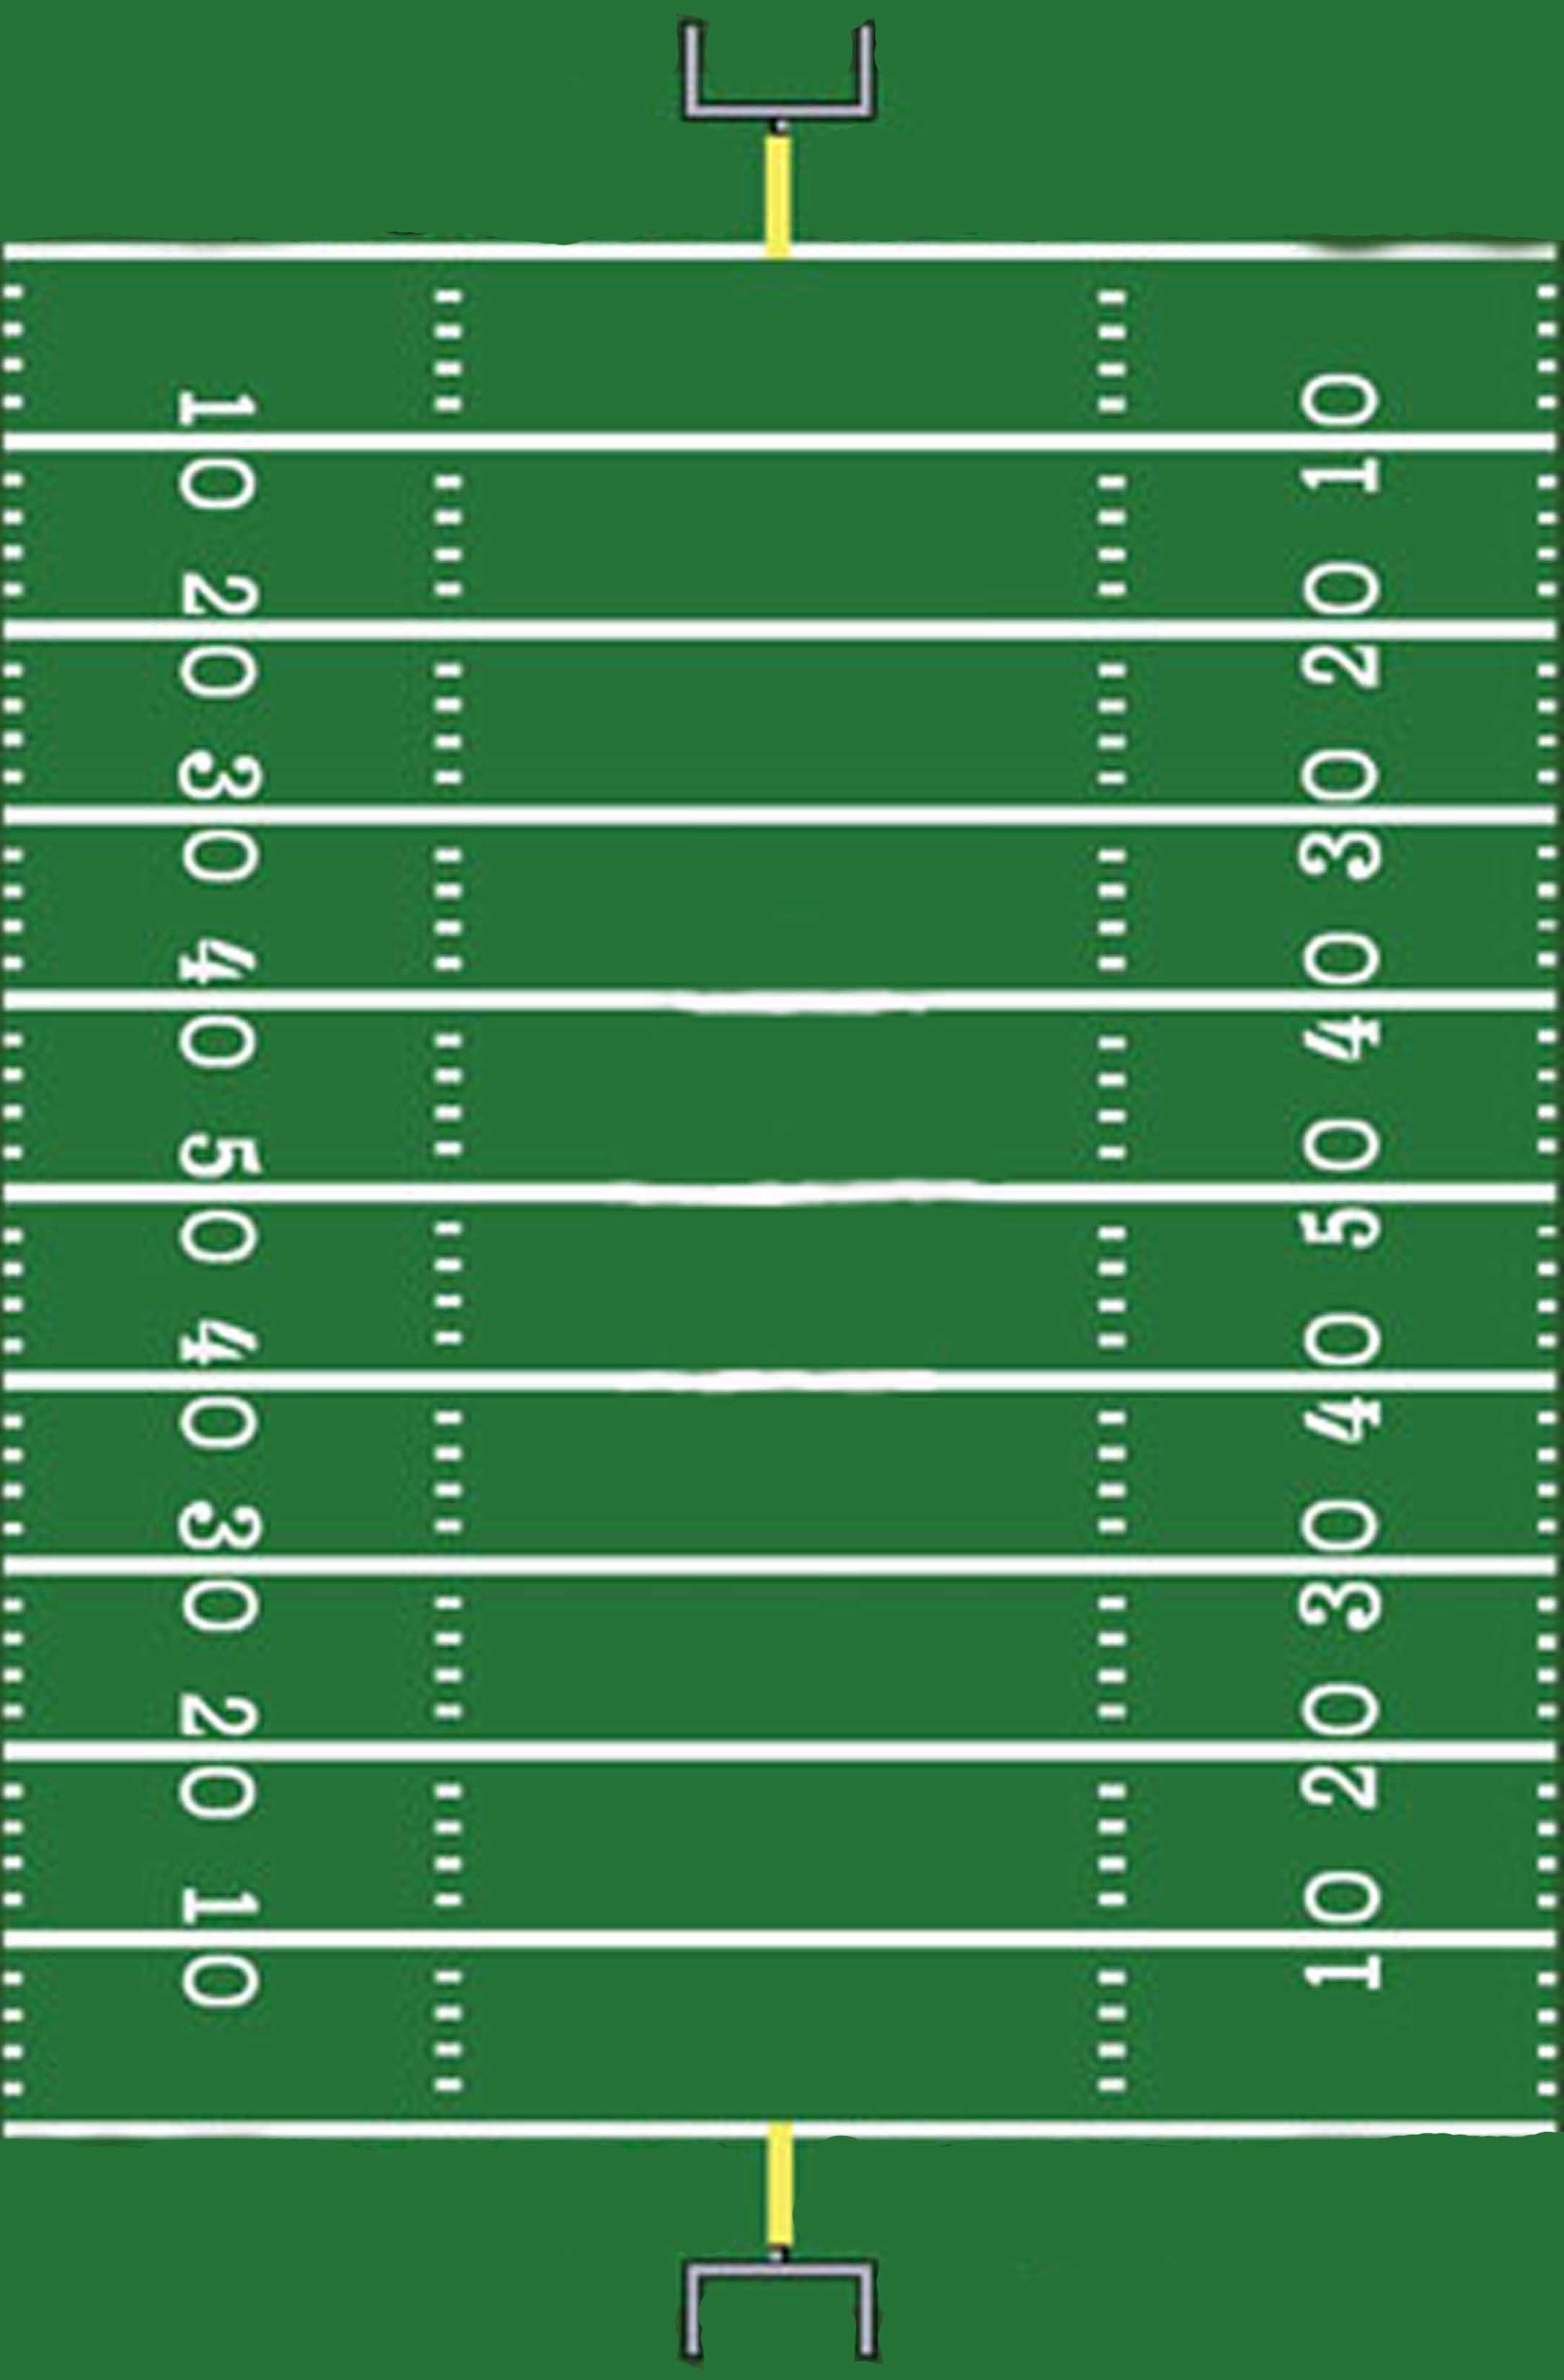 Football Field Template Printable | Rich's Den | Football Intended For Blank Football Field Template